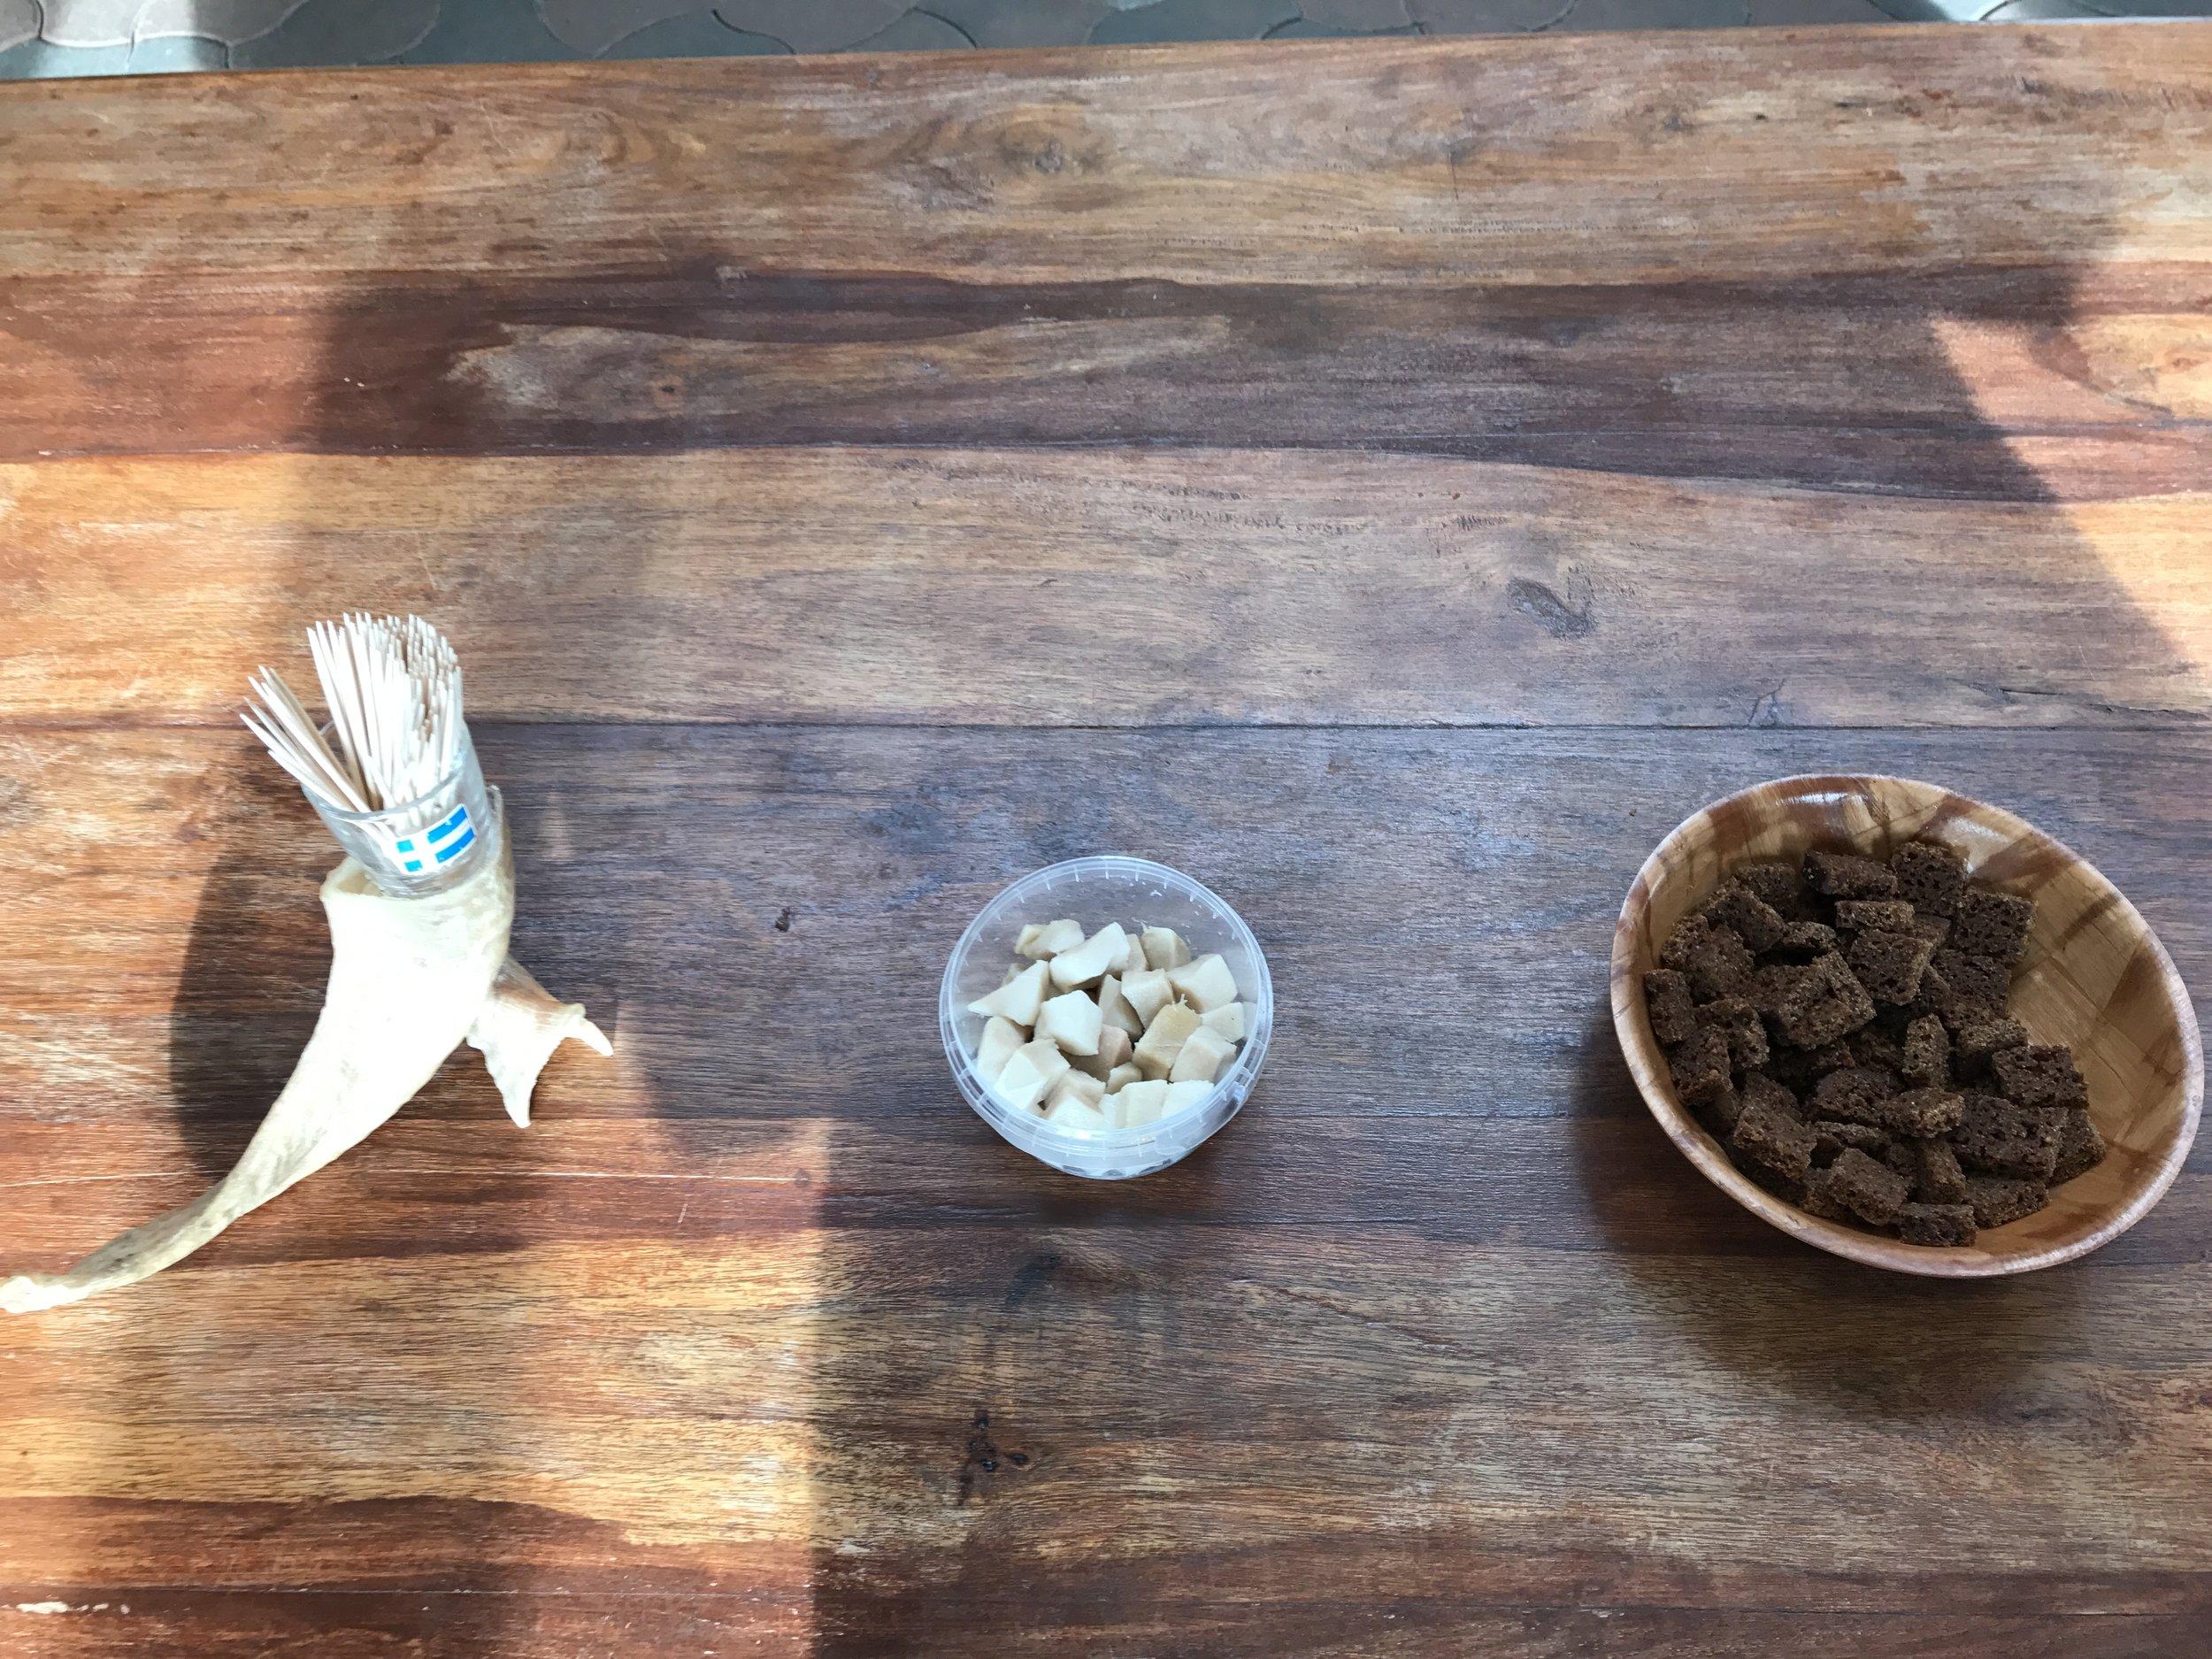 Toothpicks, shark and rye bread